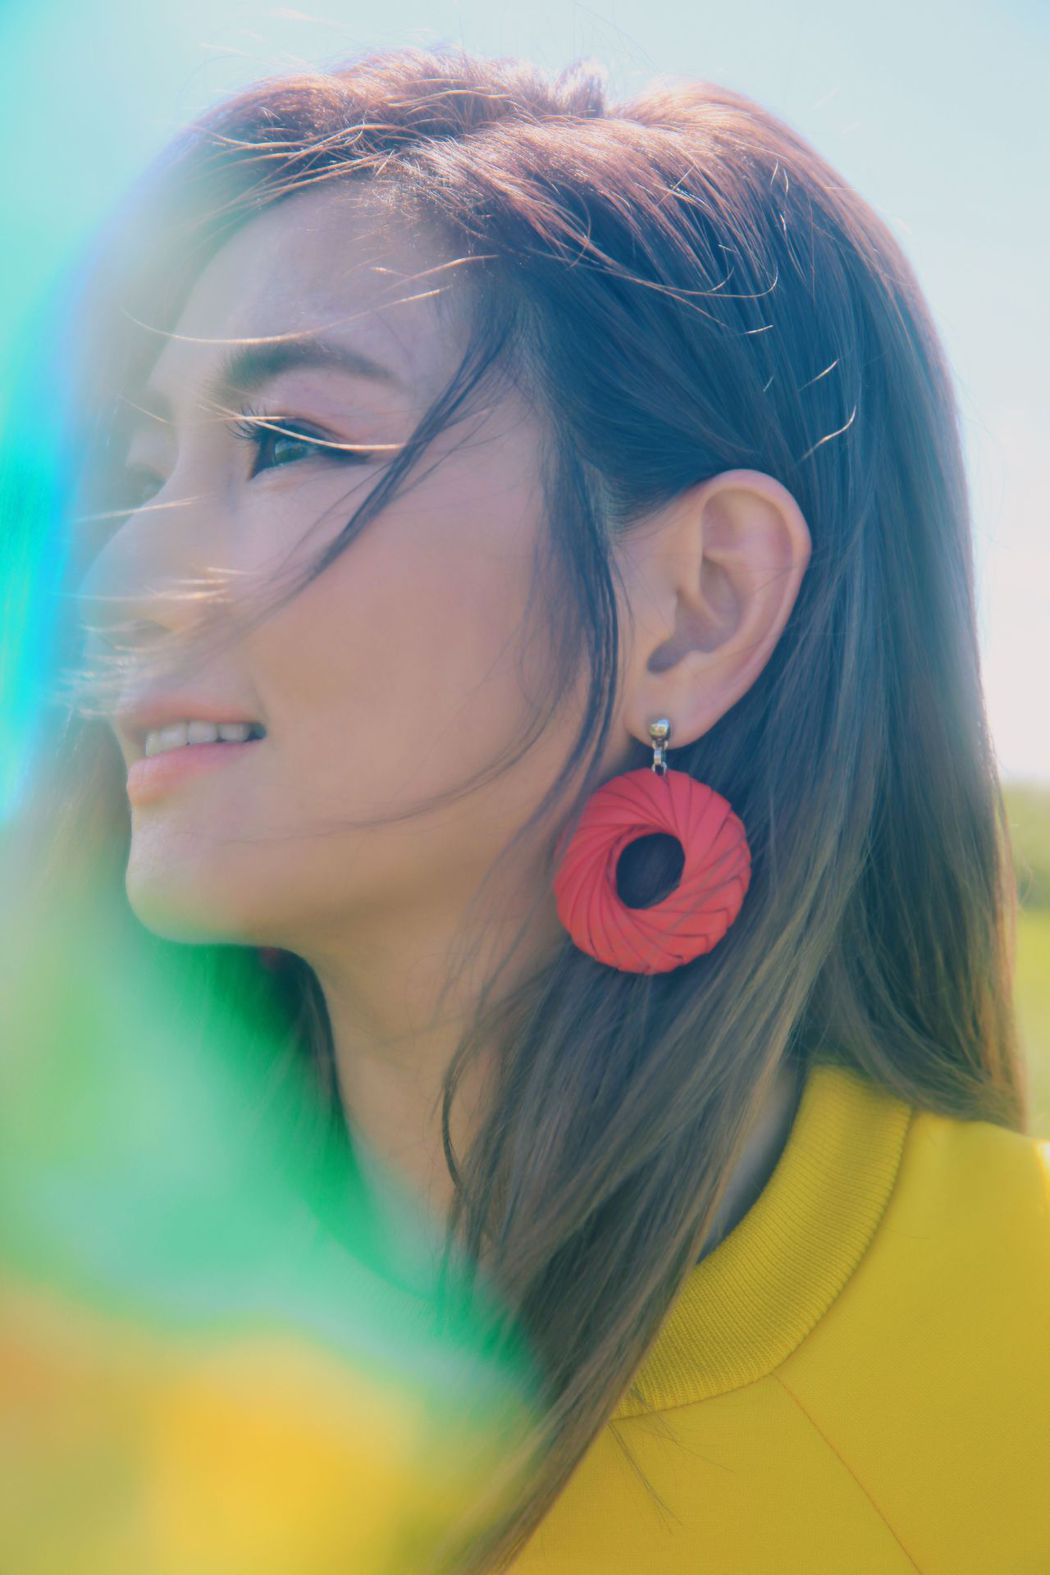 Selina為新單曲「四季」MV前進墾丁耗時兩天取景,要透過鏡頭帶領粉絲享受風光...